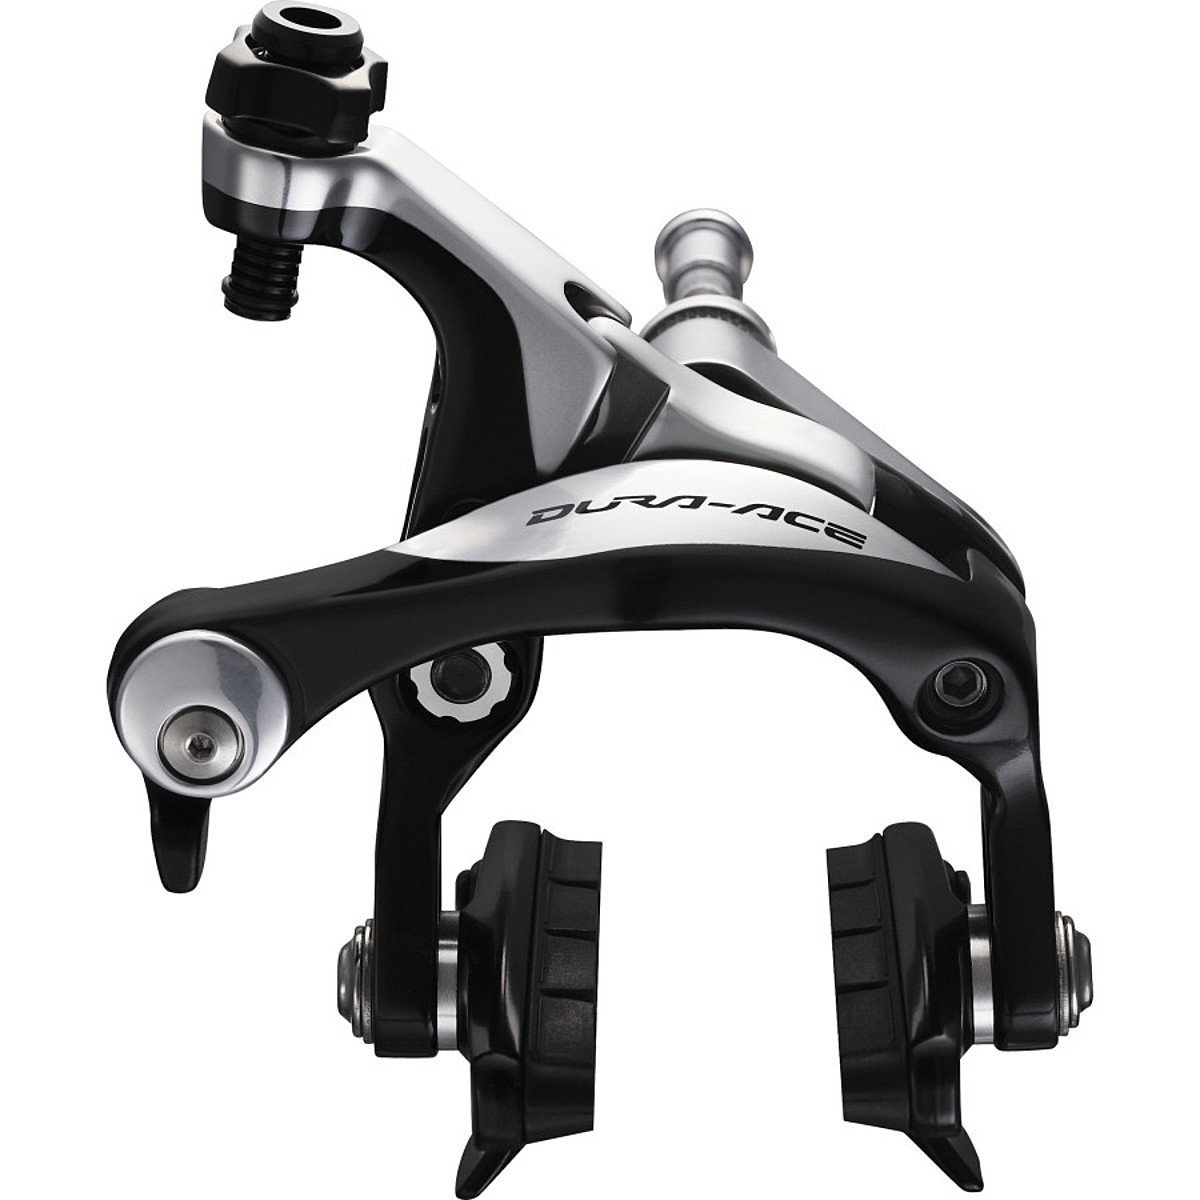 Shimano Dura-Ace BR-9000 11-Speed Brake Set (Black/Silver) [並行輸入品] B077QLBB5C